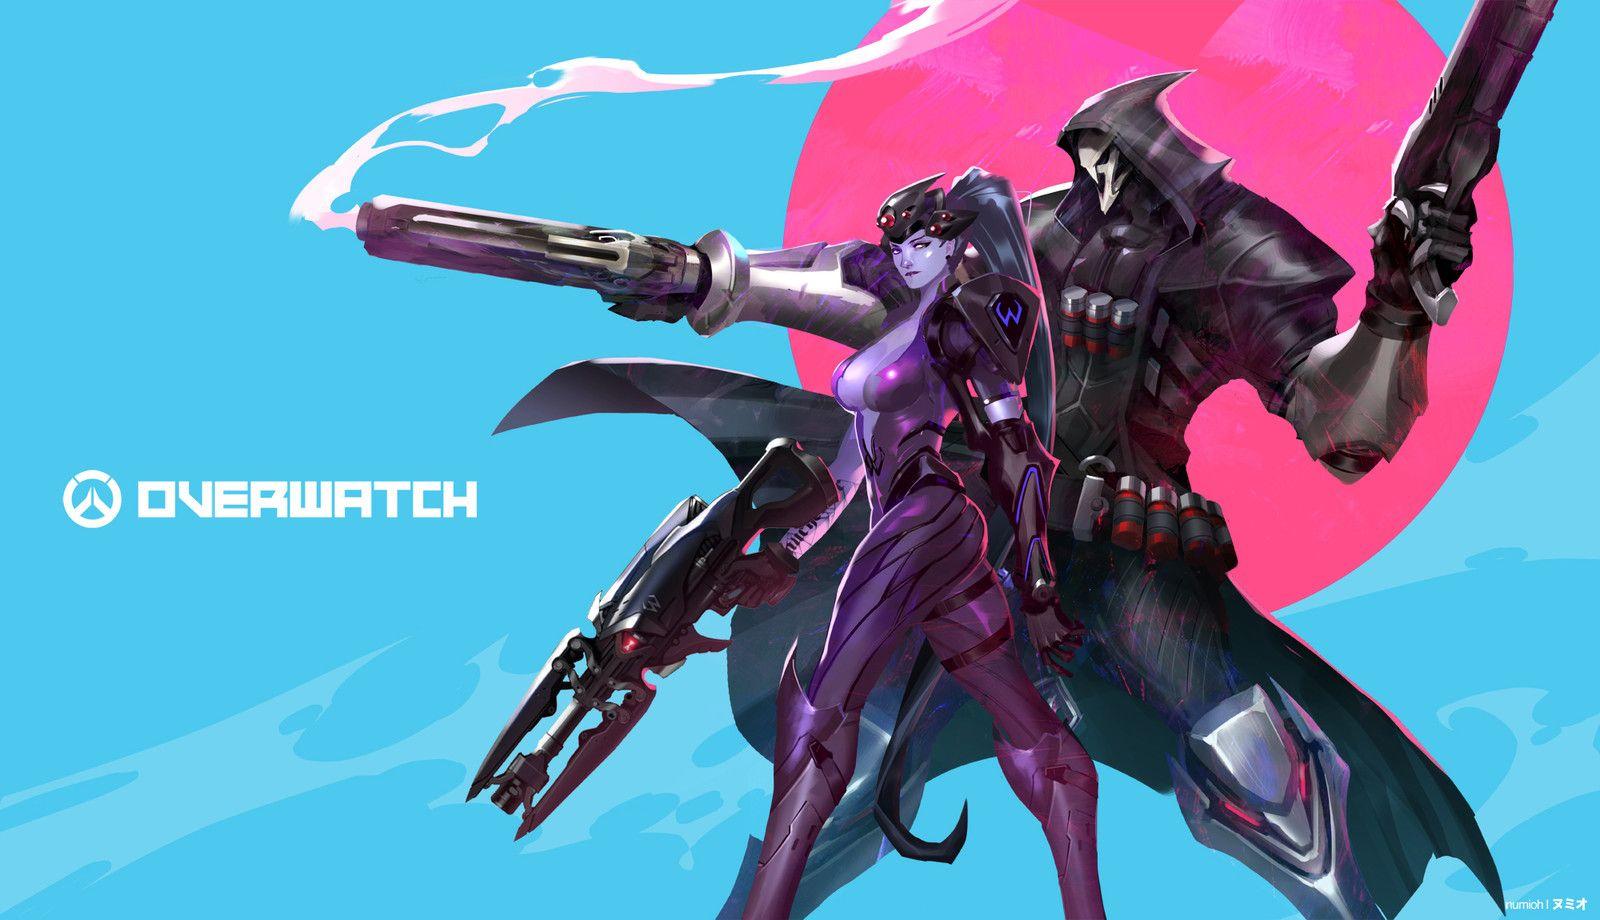 Overwatch Widow Maker & Reaper, Hoi Mun on ArtStation at